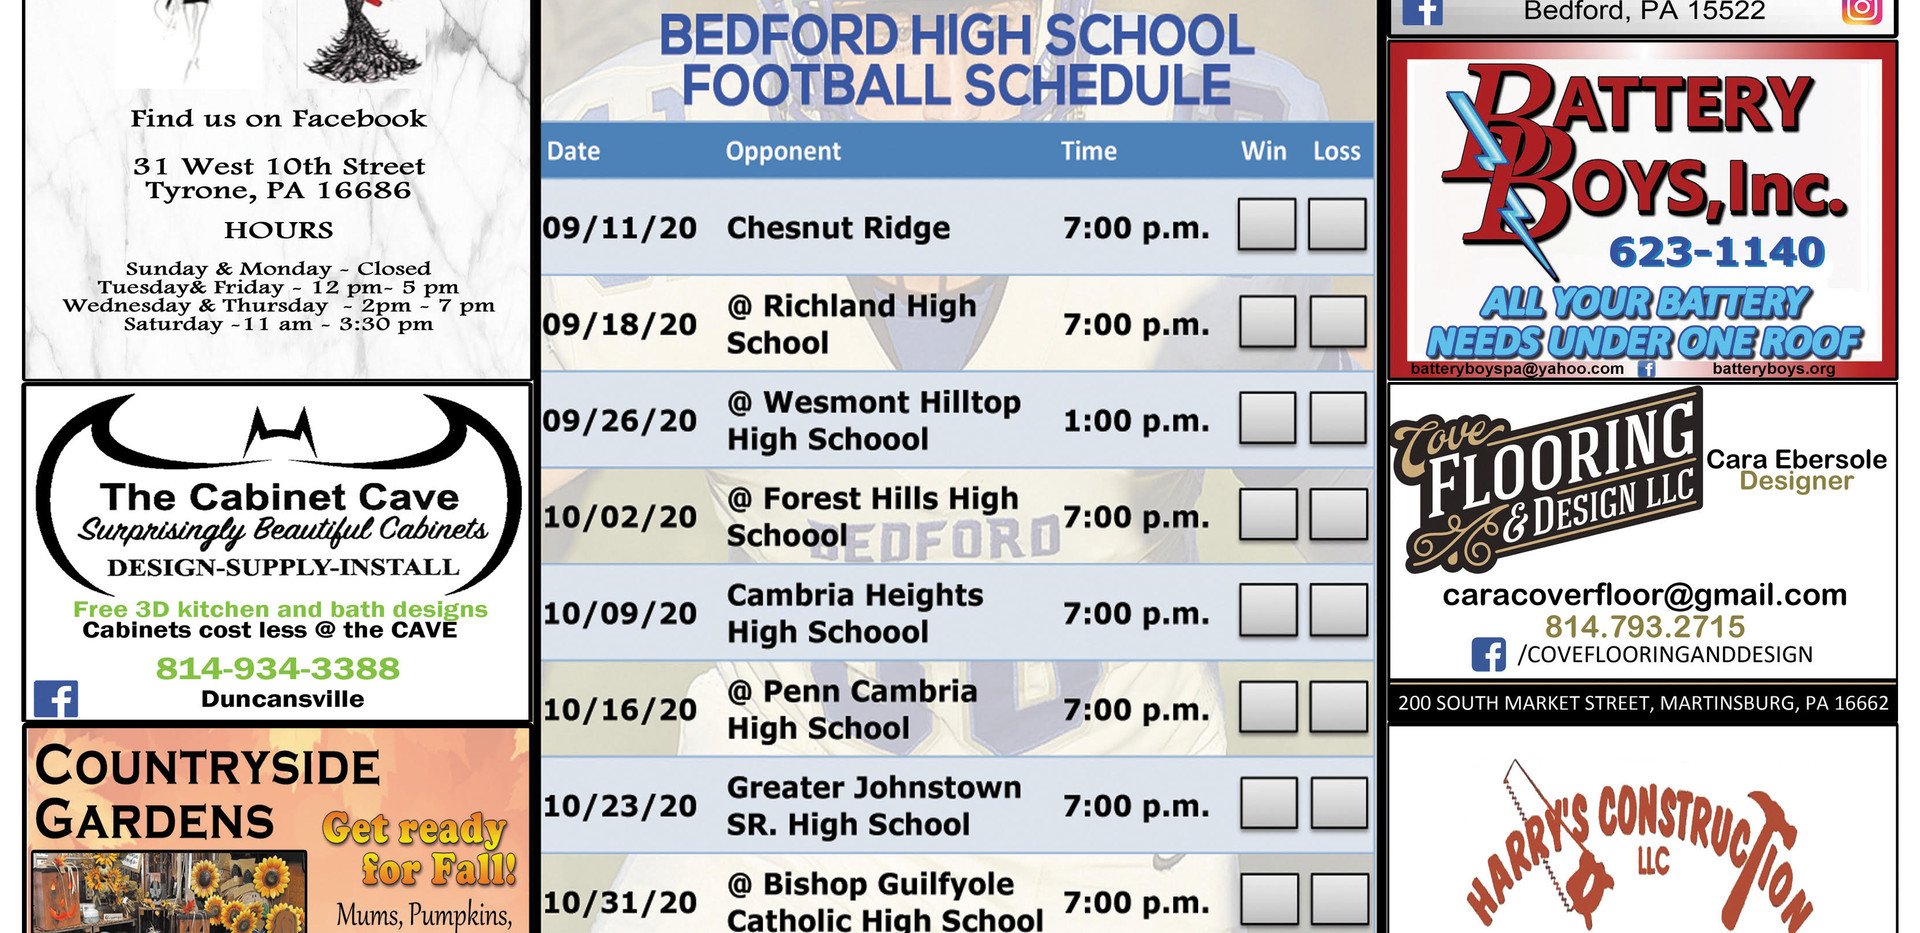 Bedford football schedule sept 2020.jpg